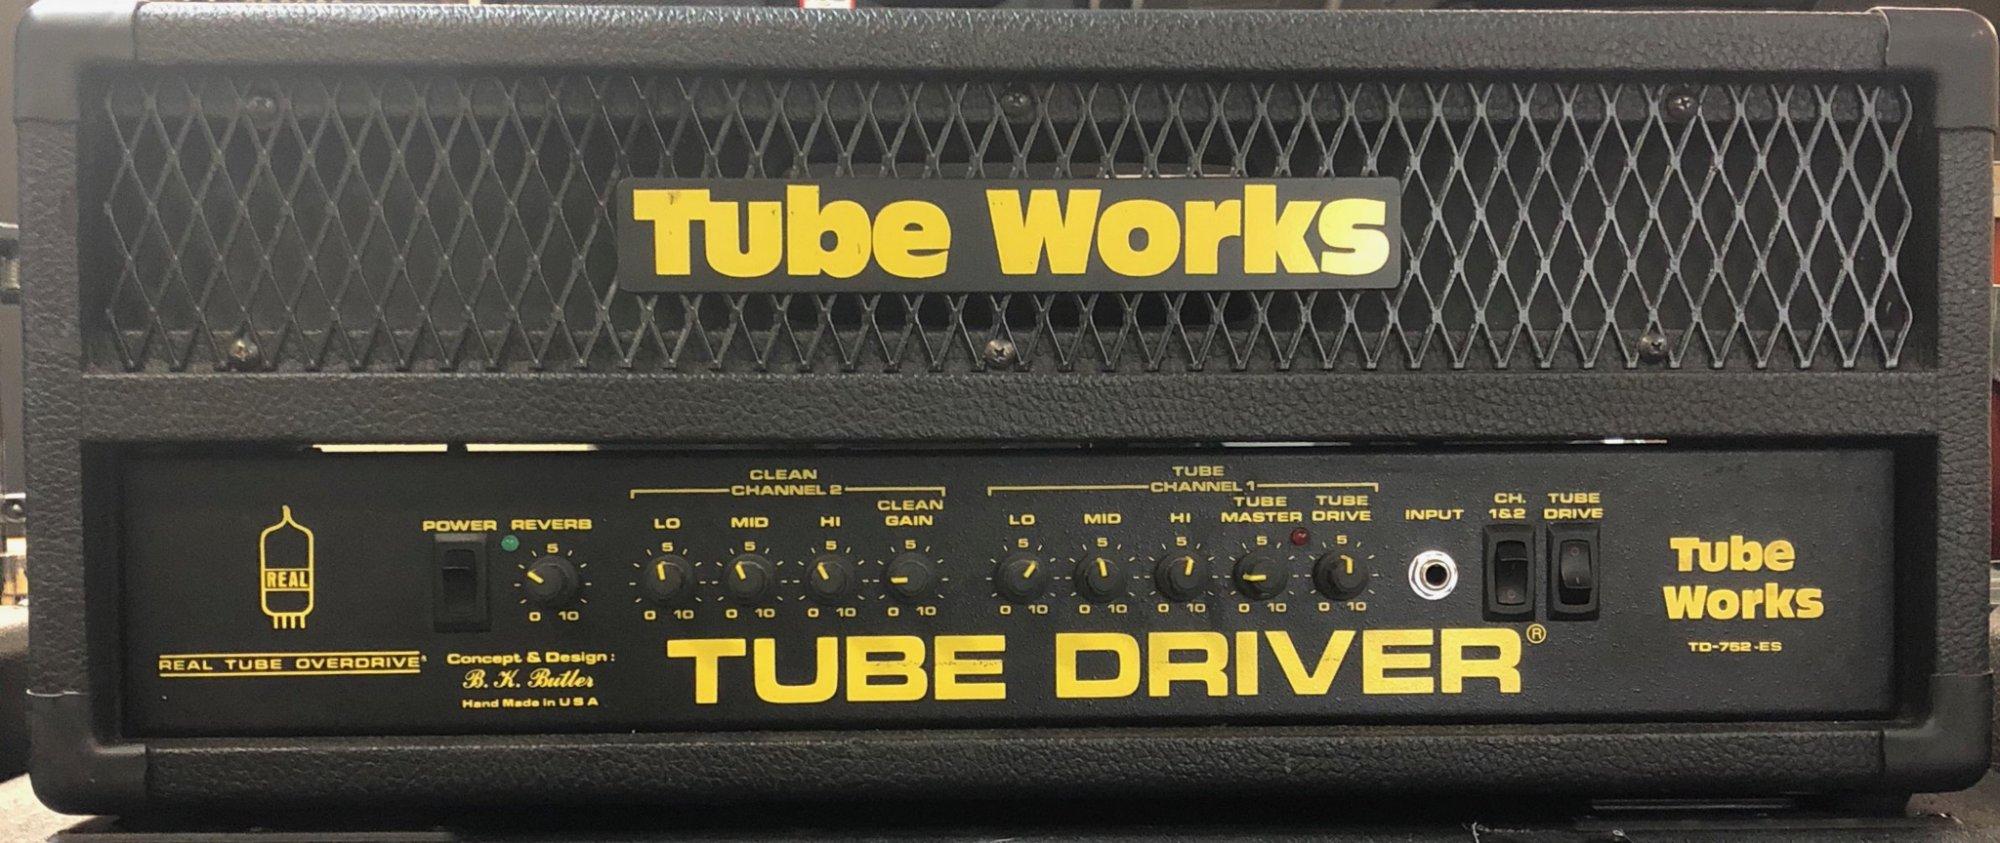 TUBE WORKS TUBE DRIVER TD-752-ES